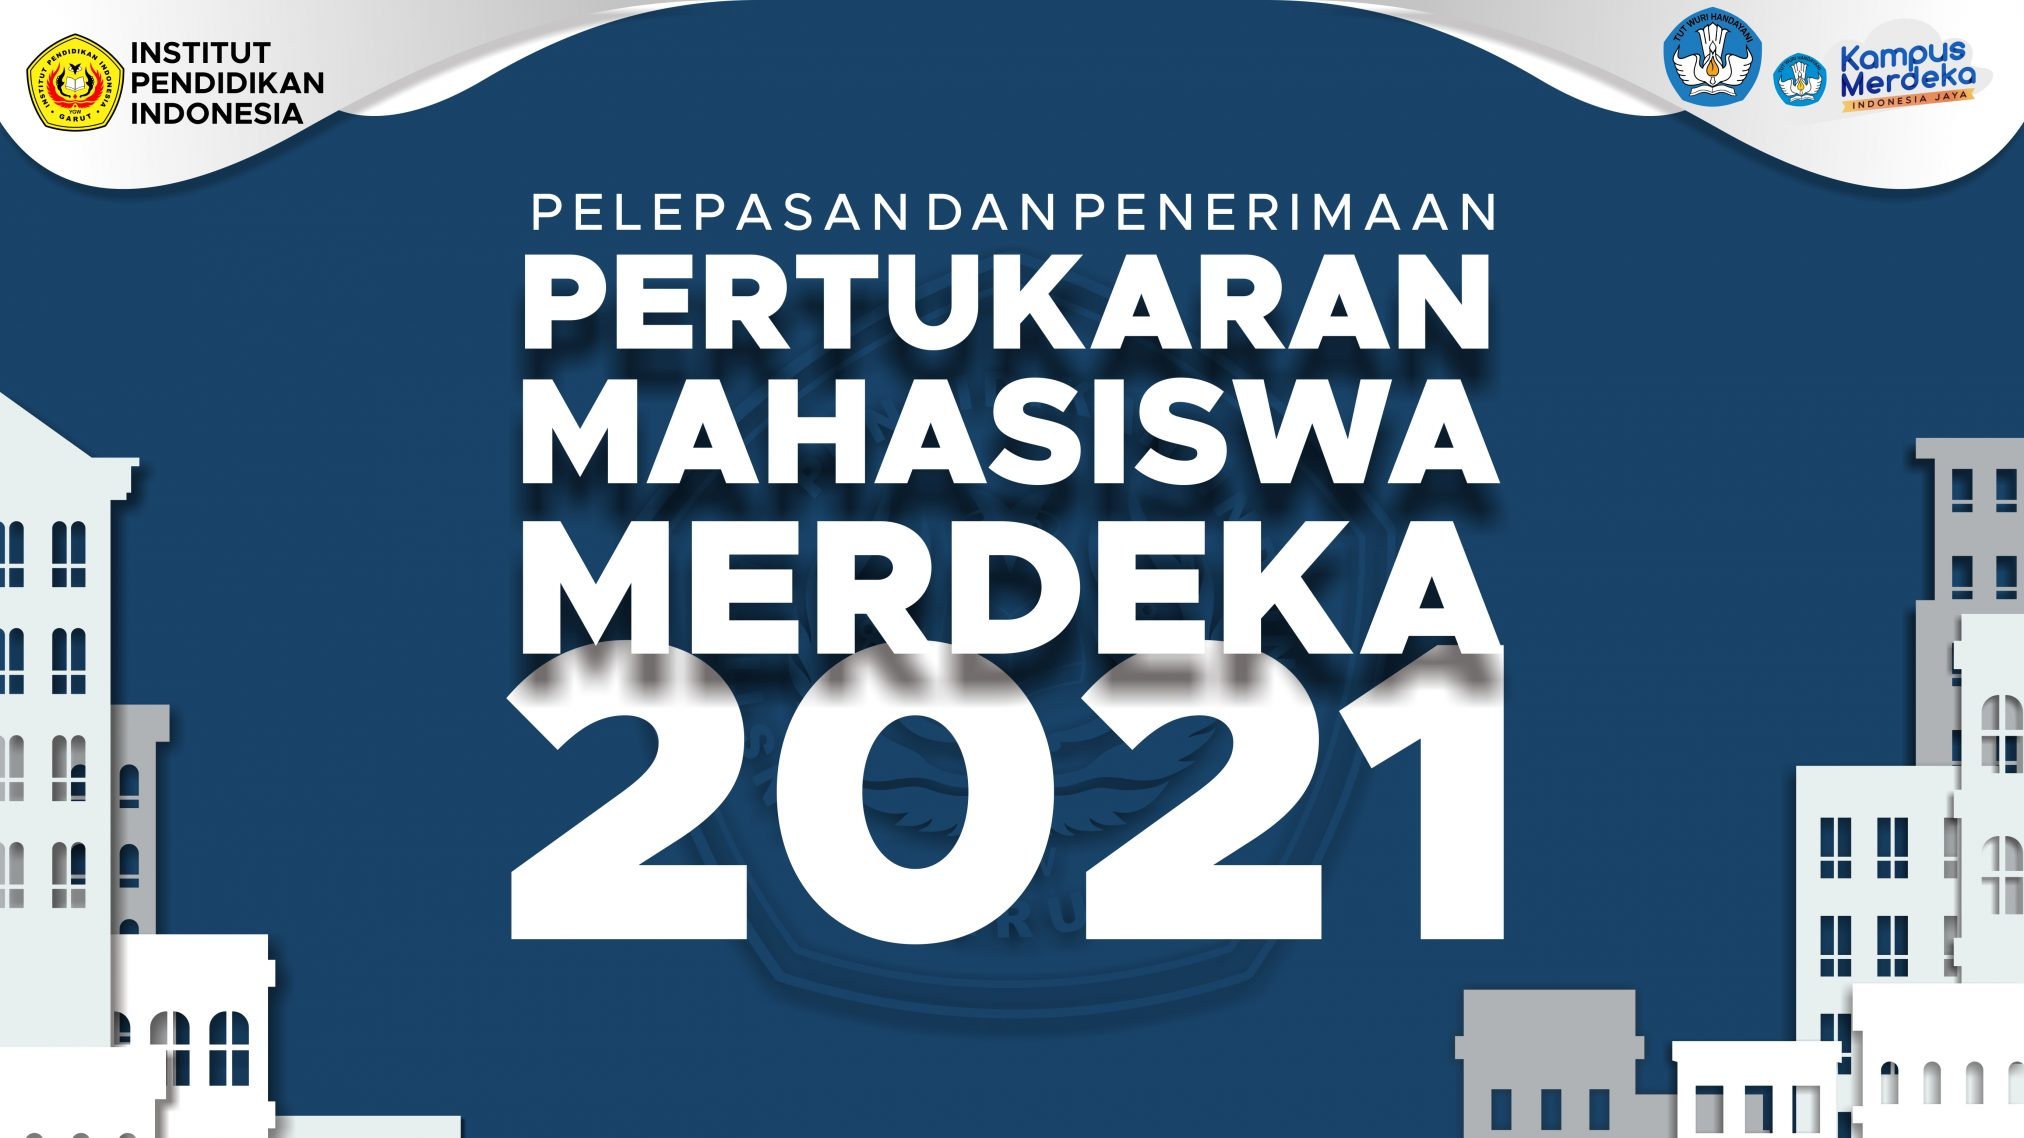 Pelepasan dan Penerimaan Program Pertukaran Mahasiswa Merdeka 2021